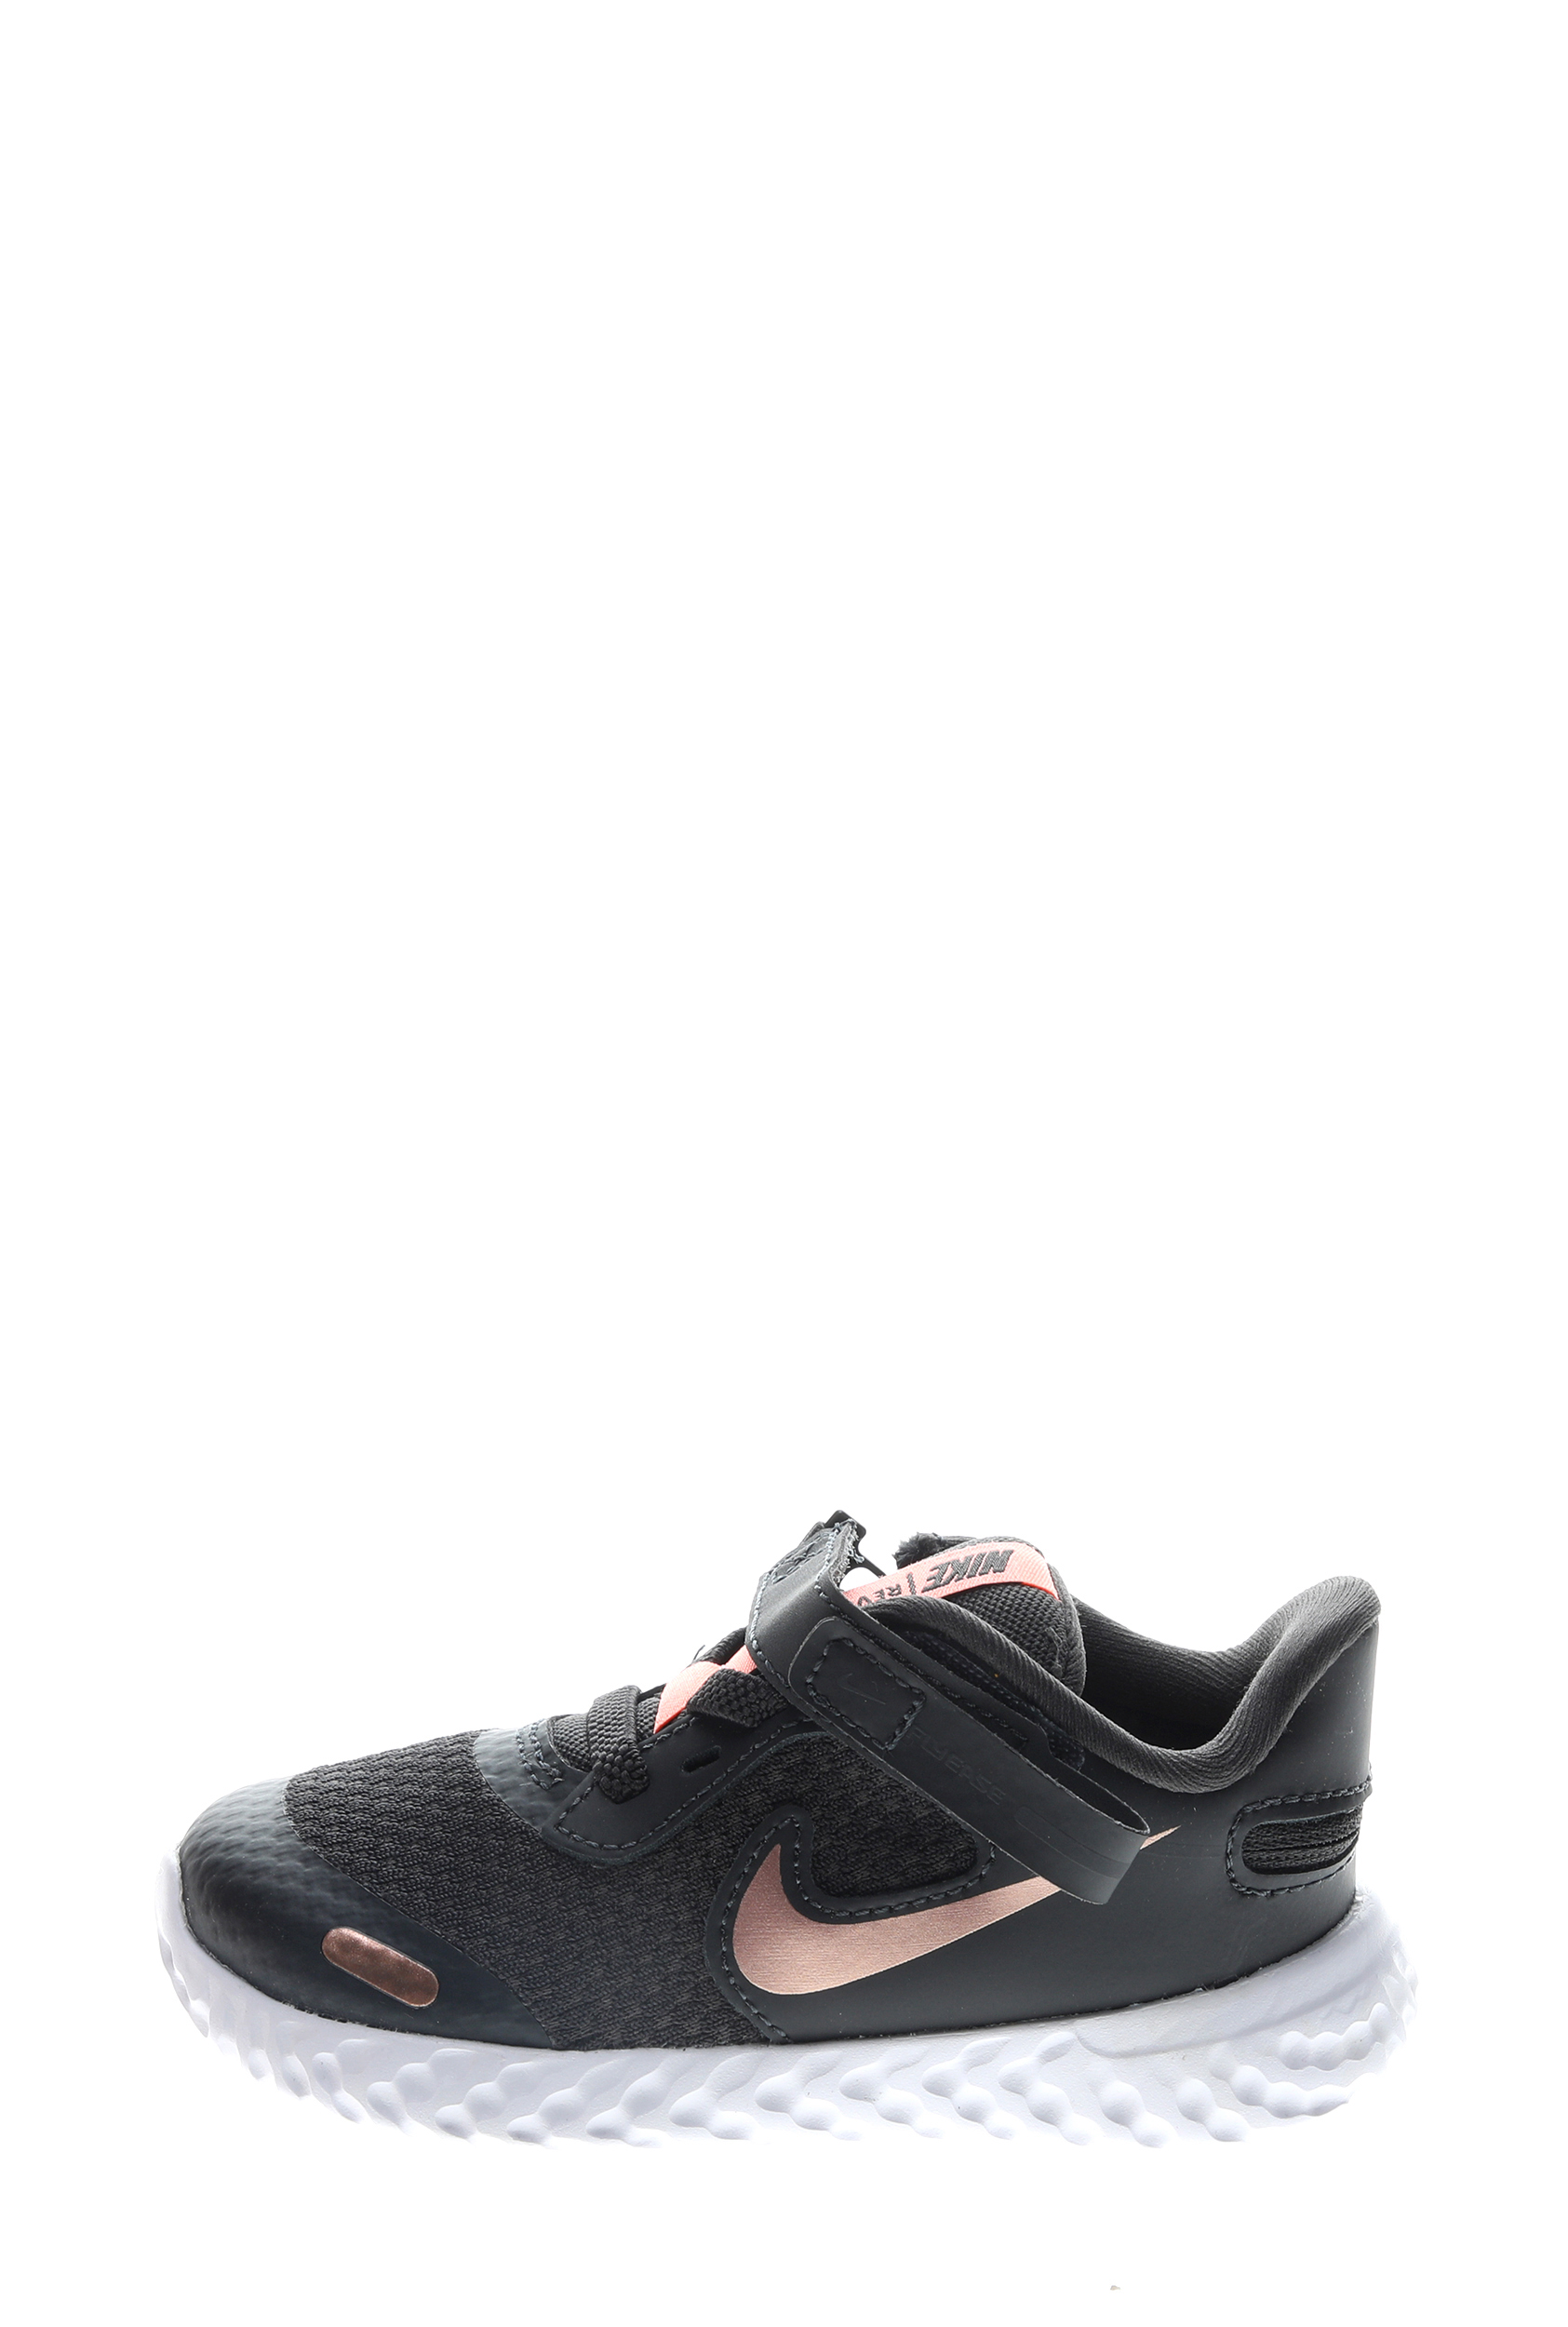 NIKE – Βρεφικά αθλητικά παπούτσια Nike Revolution 5 FLYEASE (TDV) μαύρα χρυσά